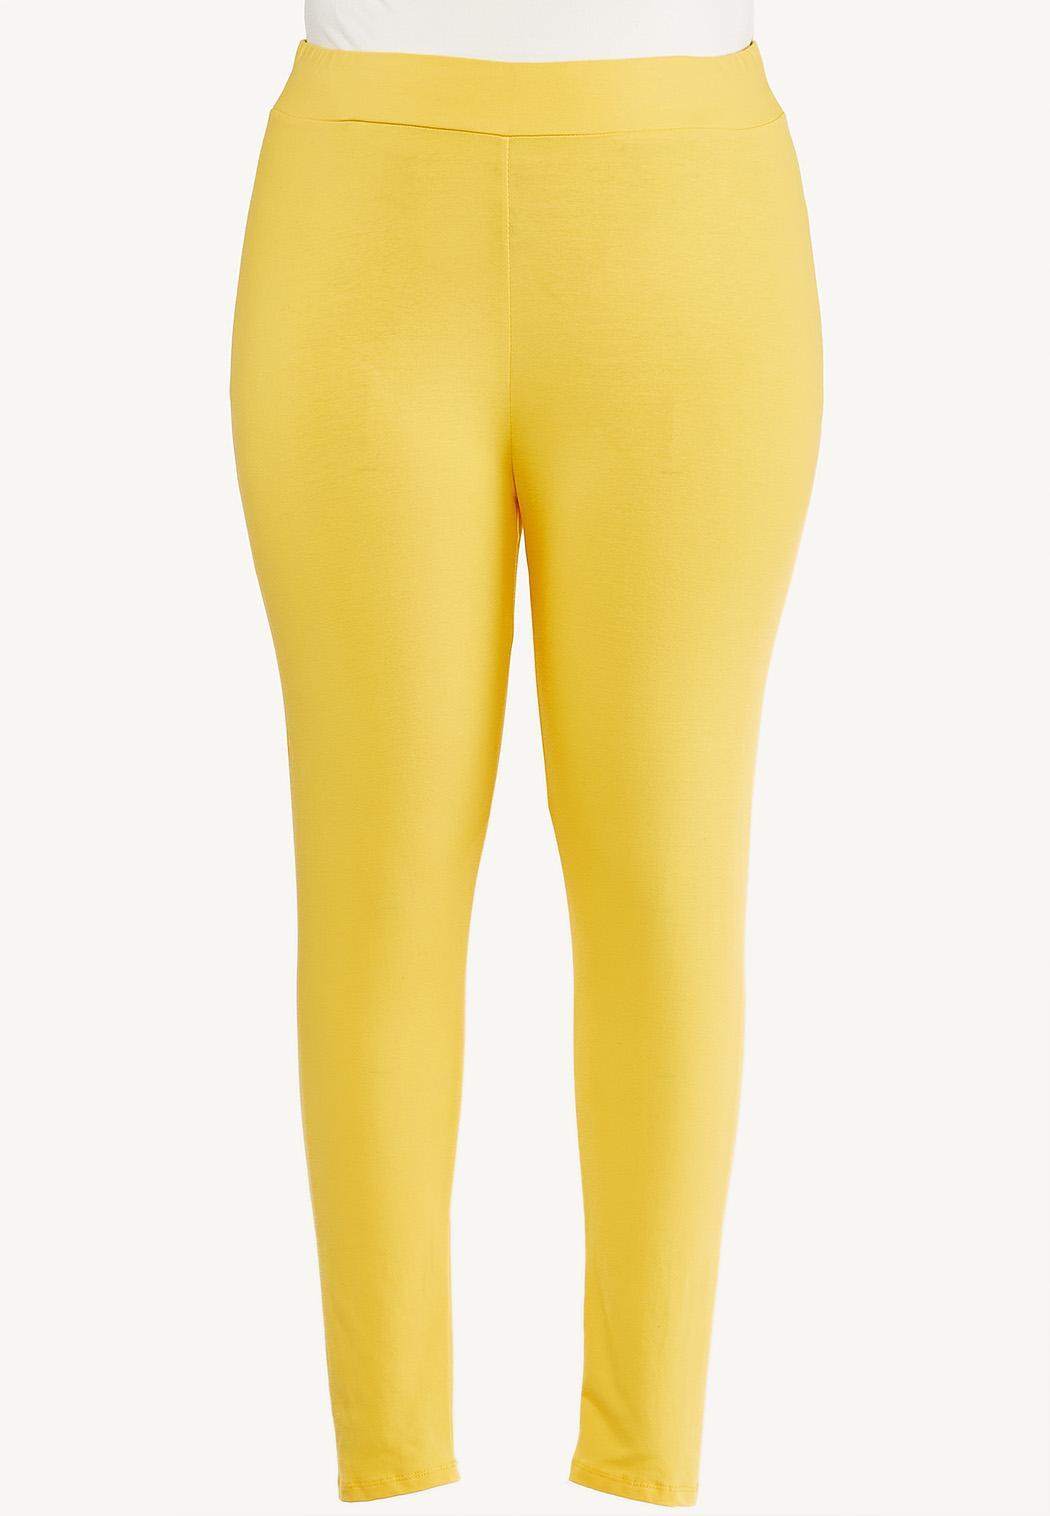 Plus Size Casual Knit Leggings